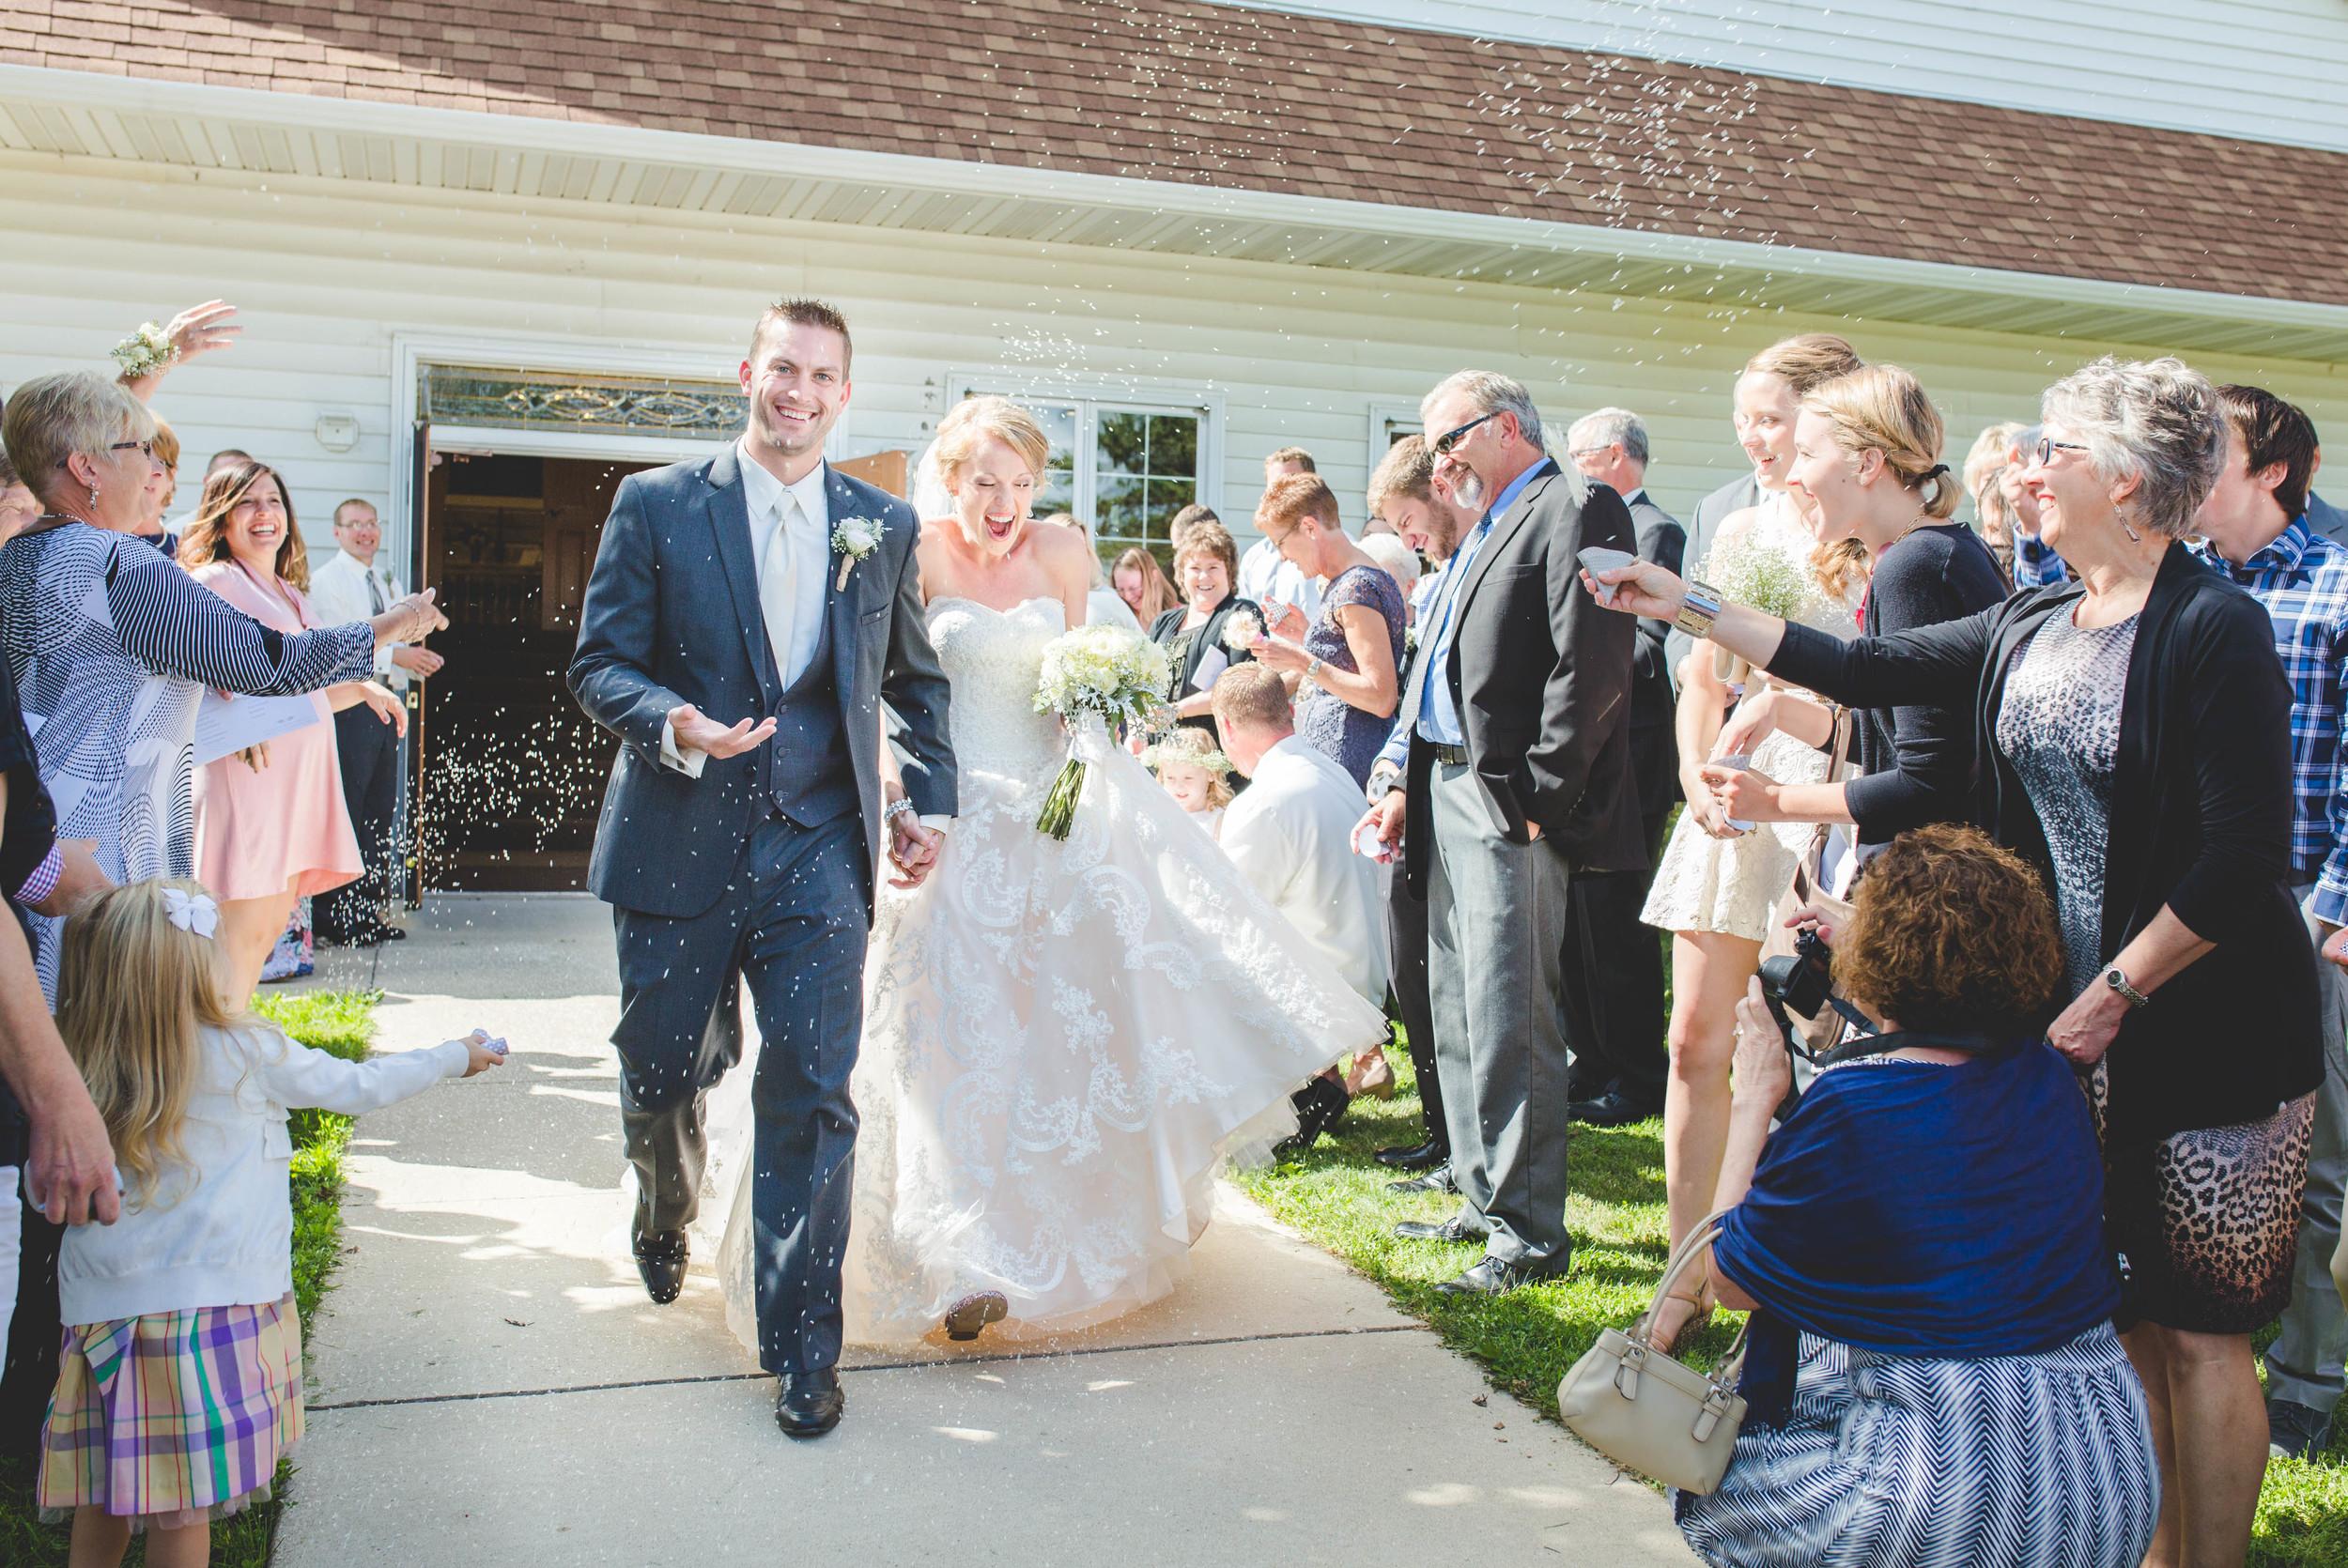 #mnwedding #mnphotographer #countrycharm #brideandgroom #justmarried